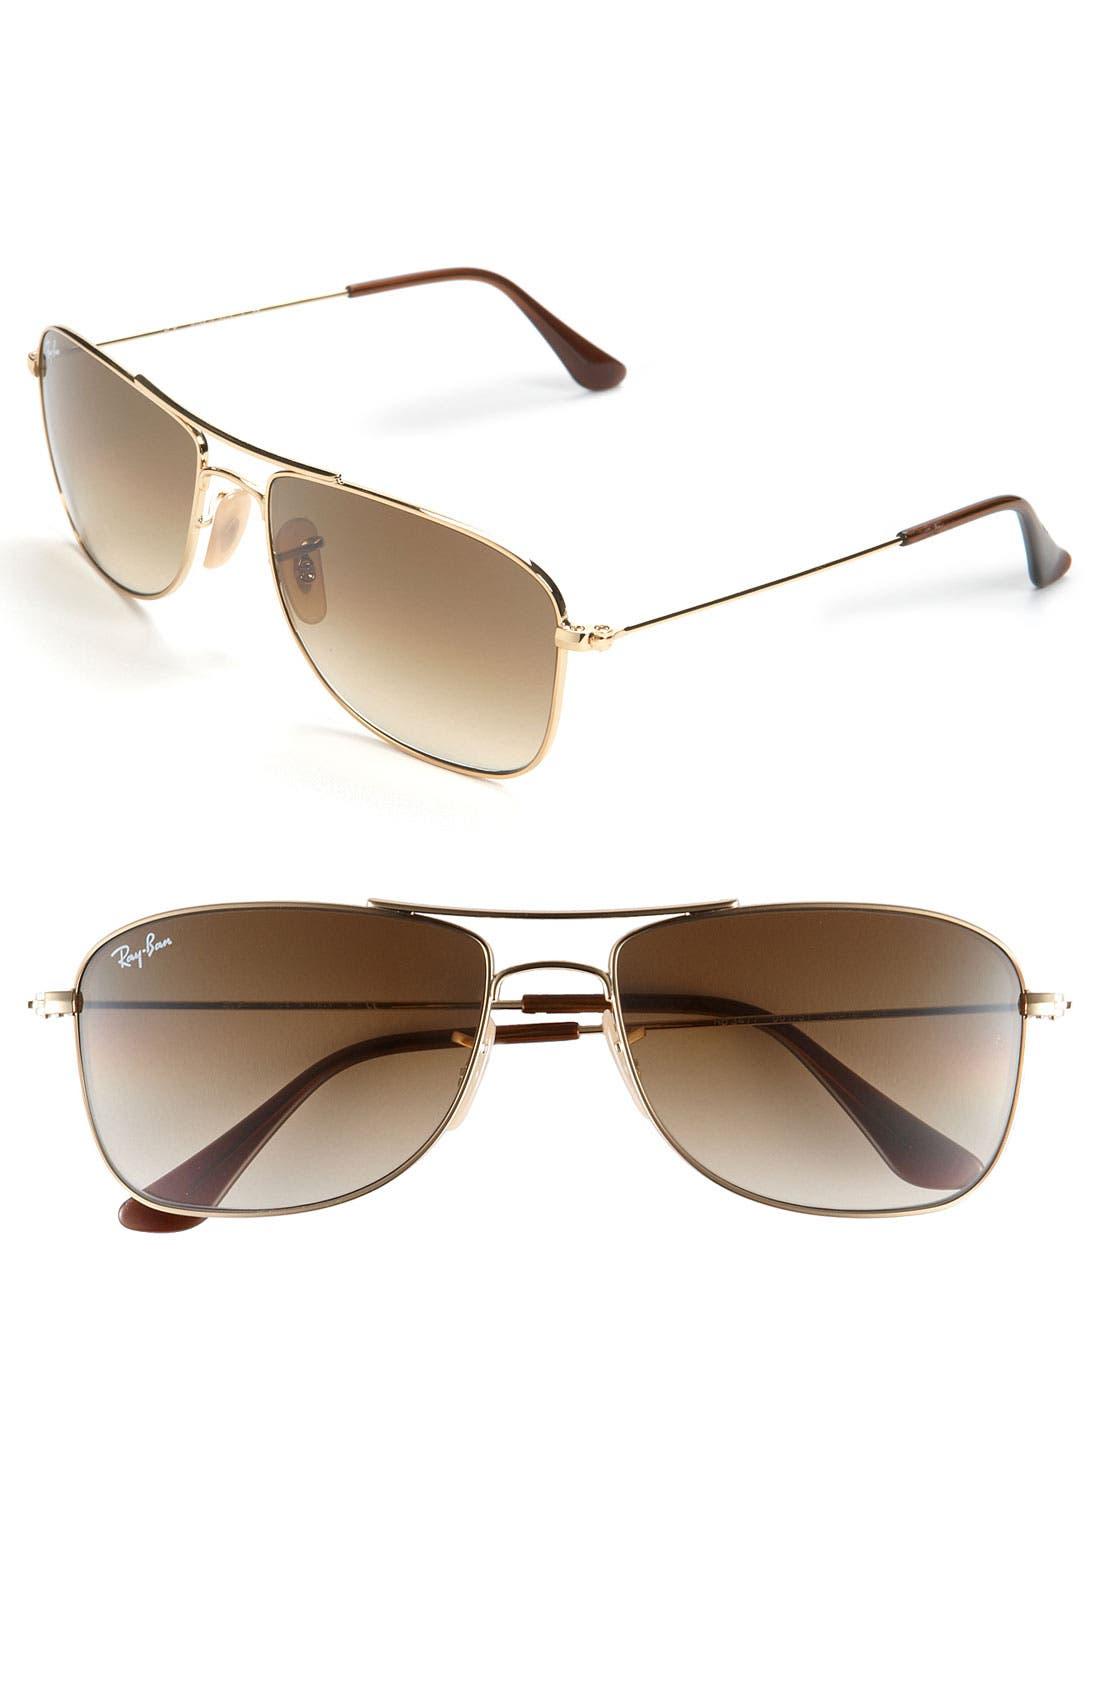 Main Image - Ray-Ban 'Square Aviator' 56mm Sunglasses